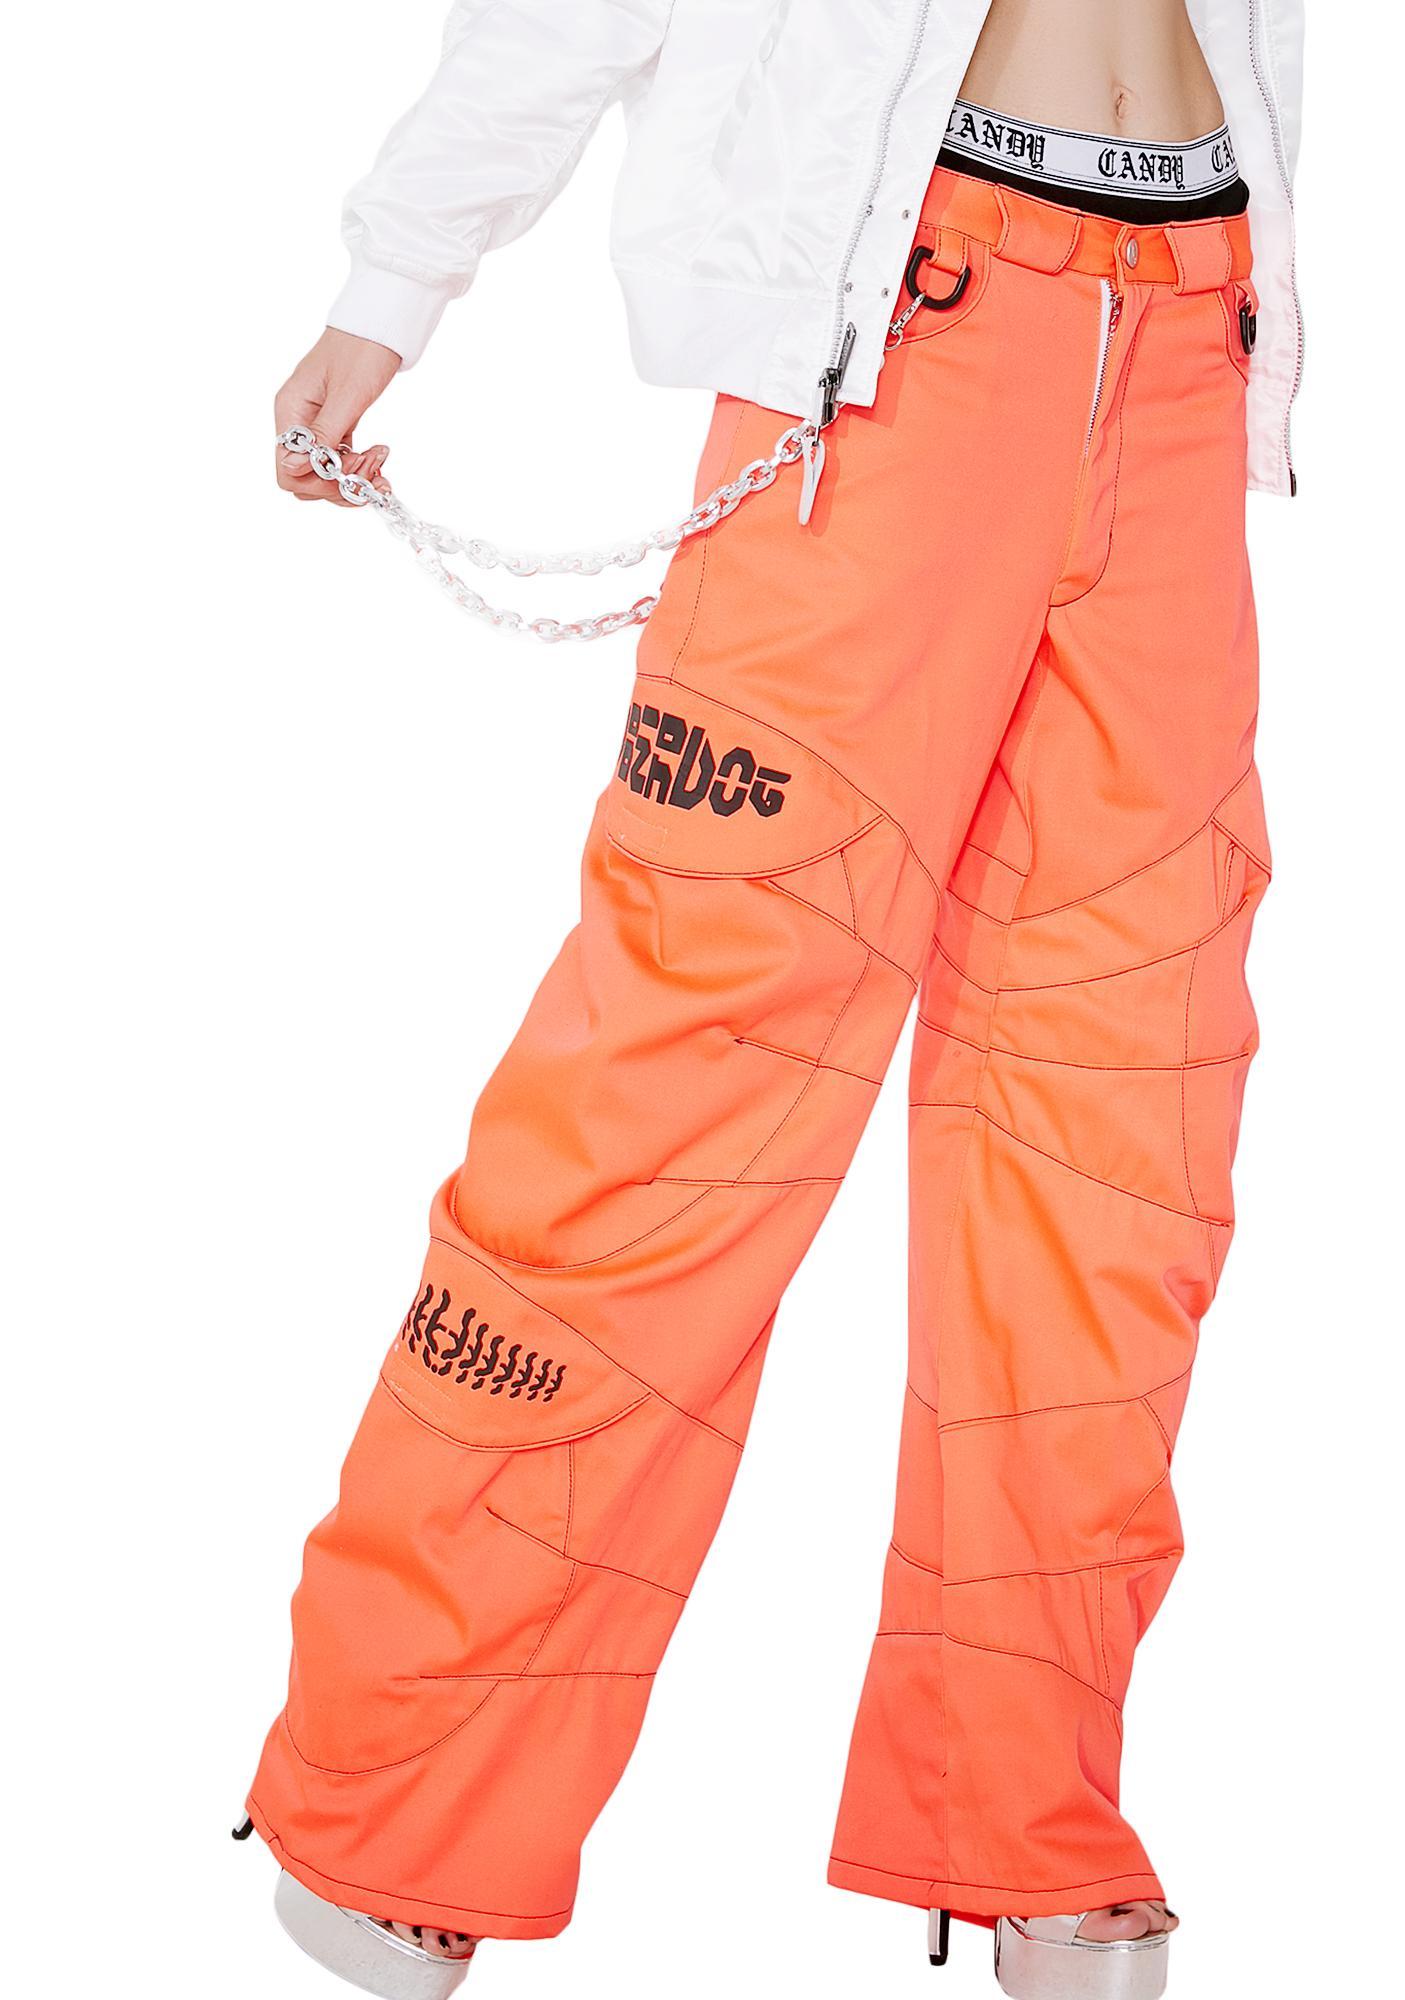 Cyberdog Protonic Pants